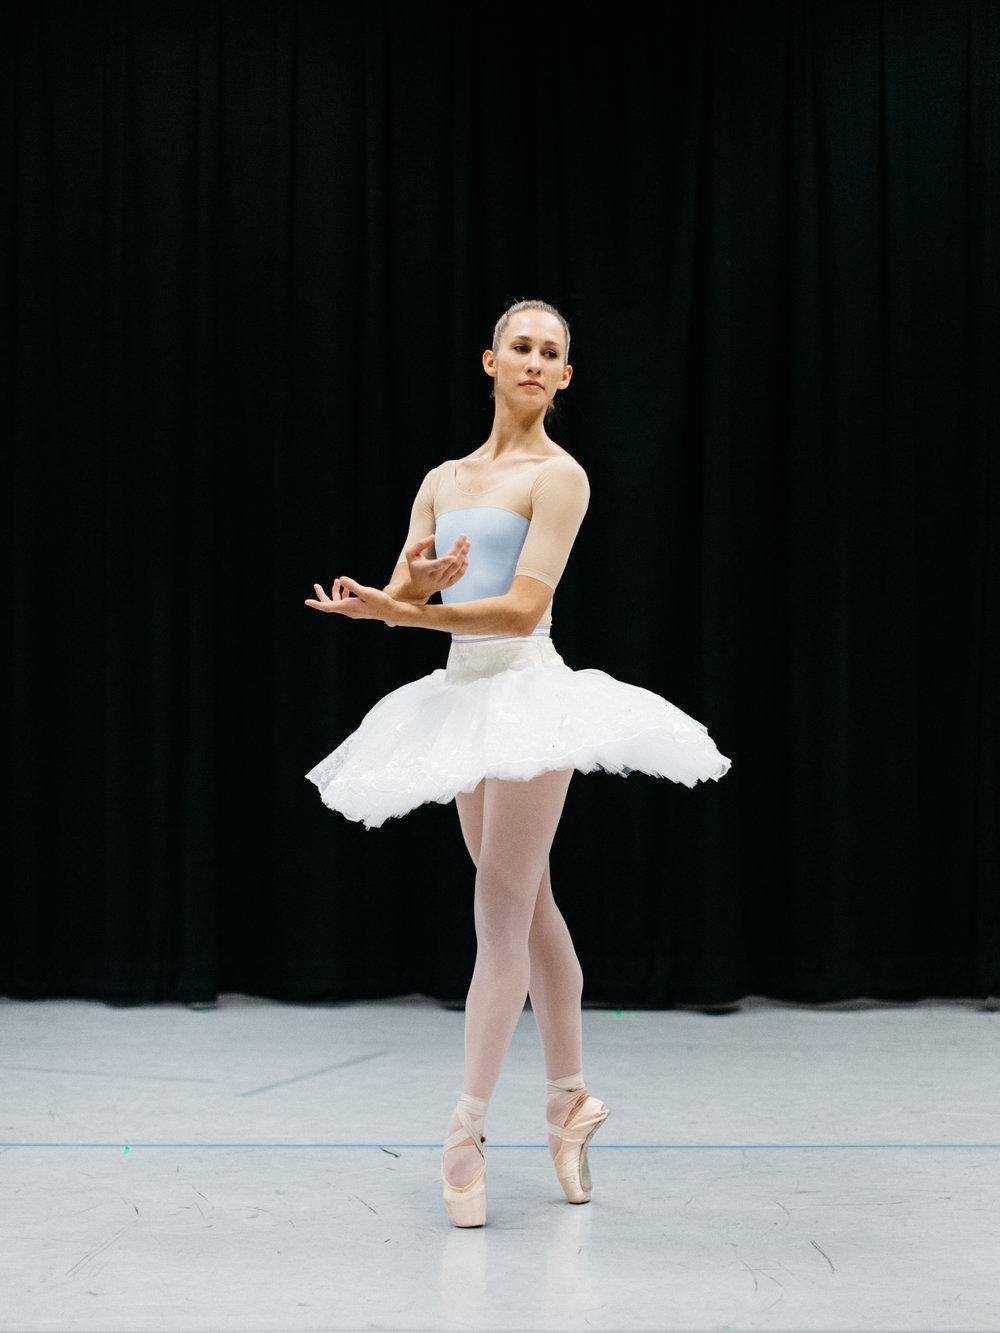 Jessica_Ballet-16.JPG